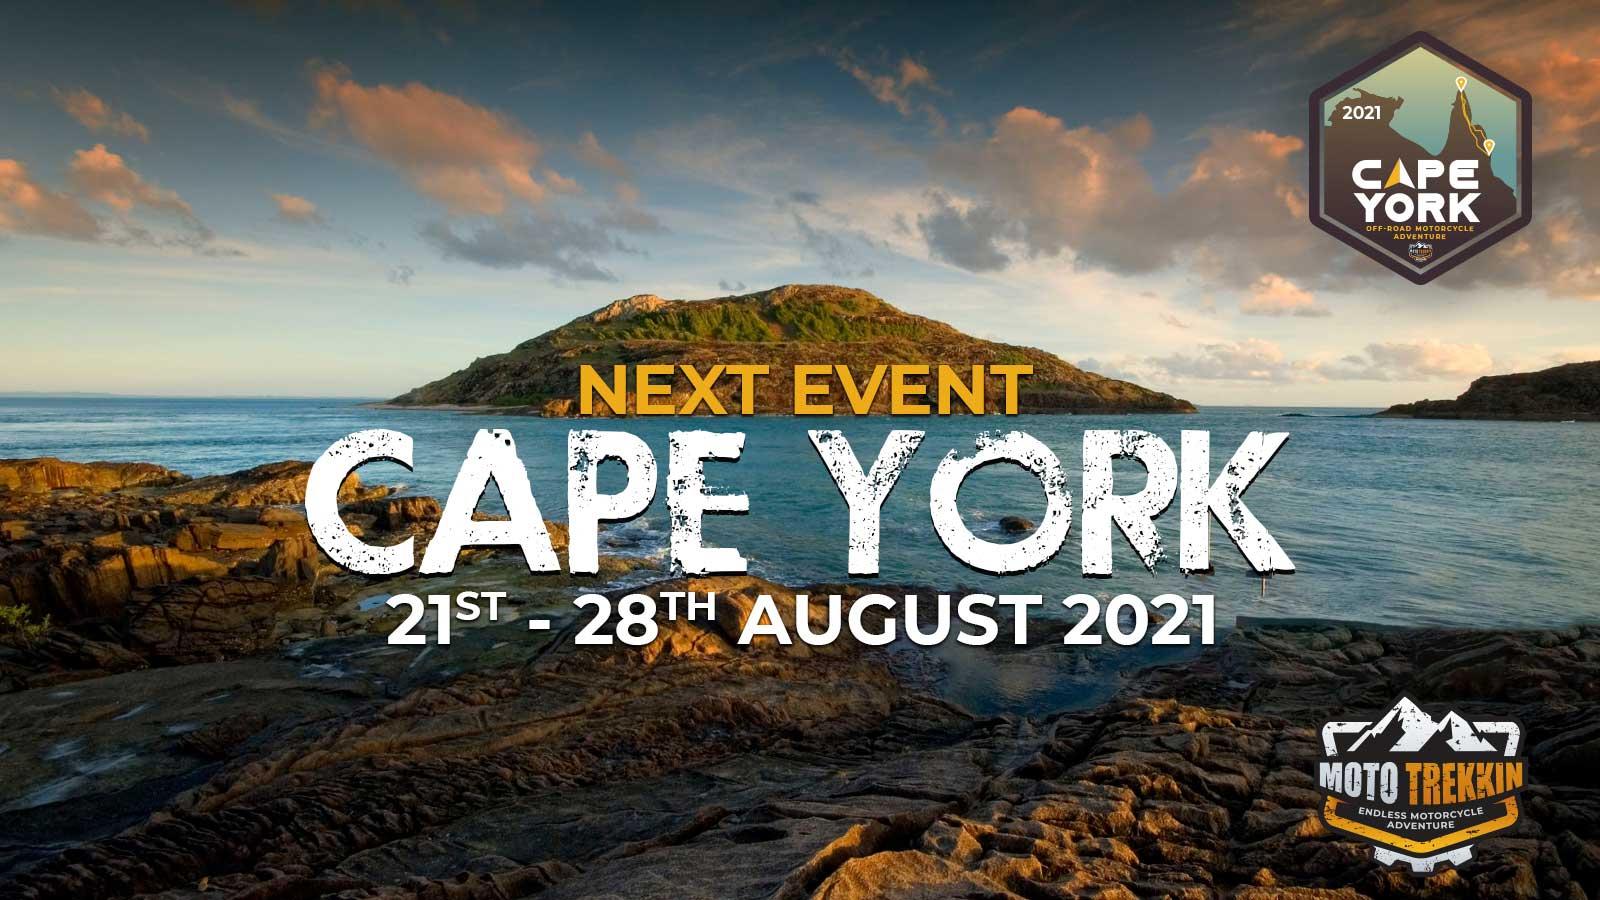 Cape York 2021